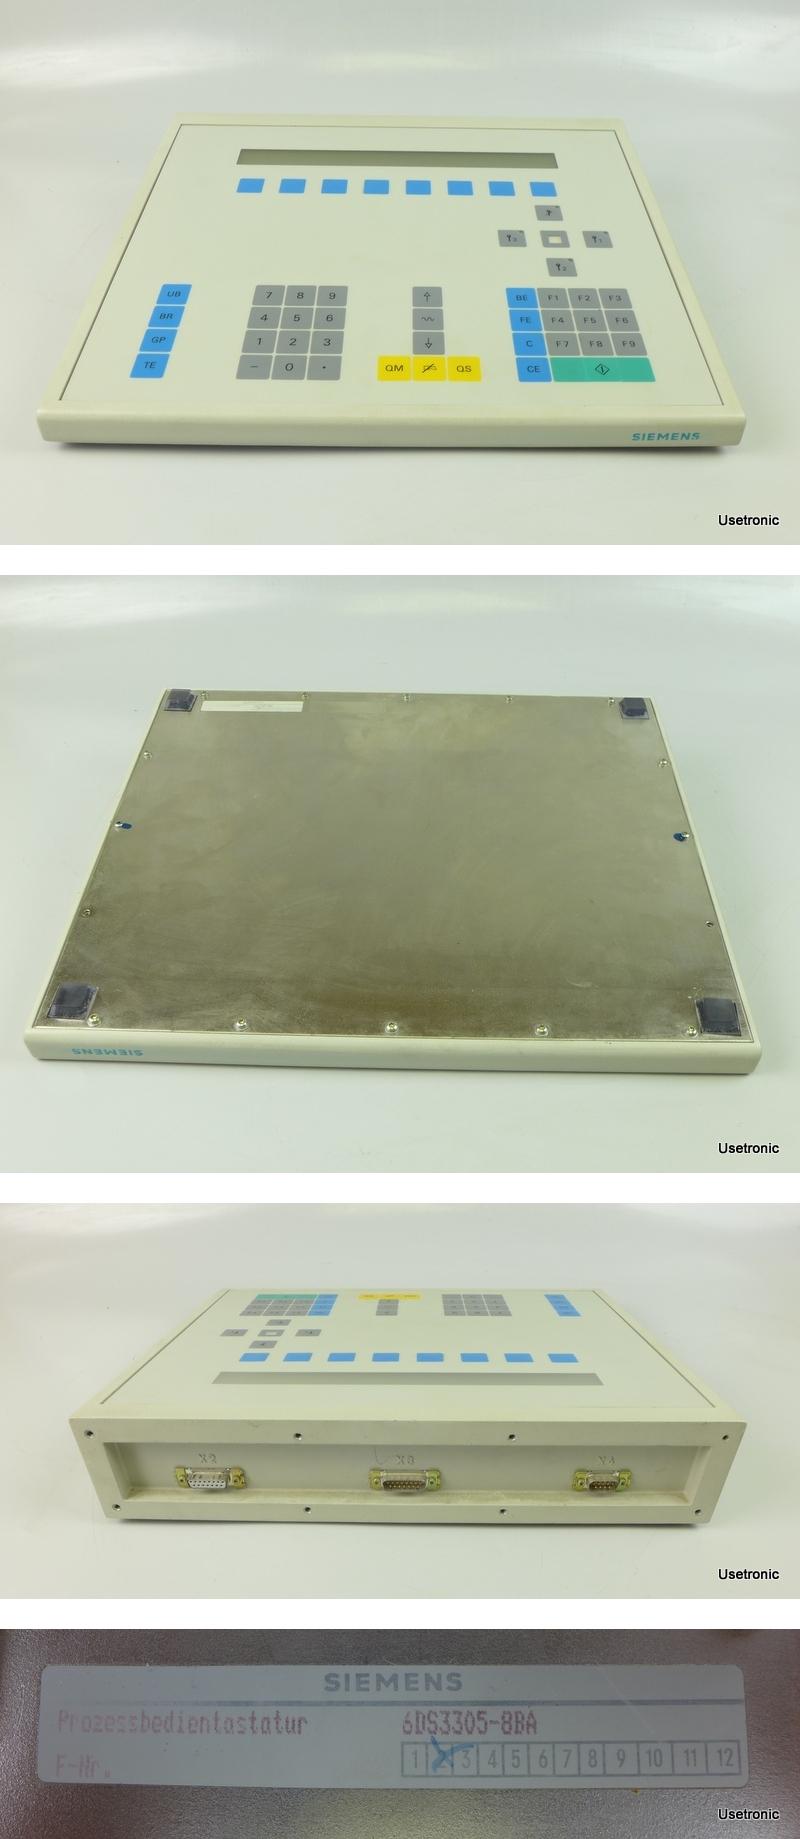 Siemens 6DS3305-8BA